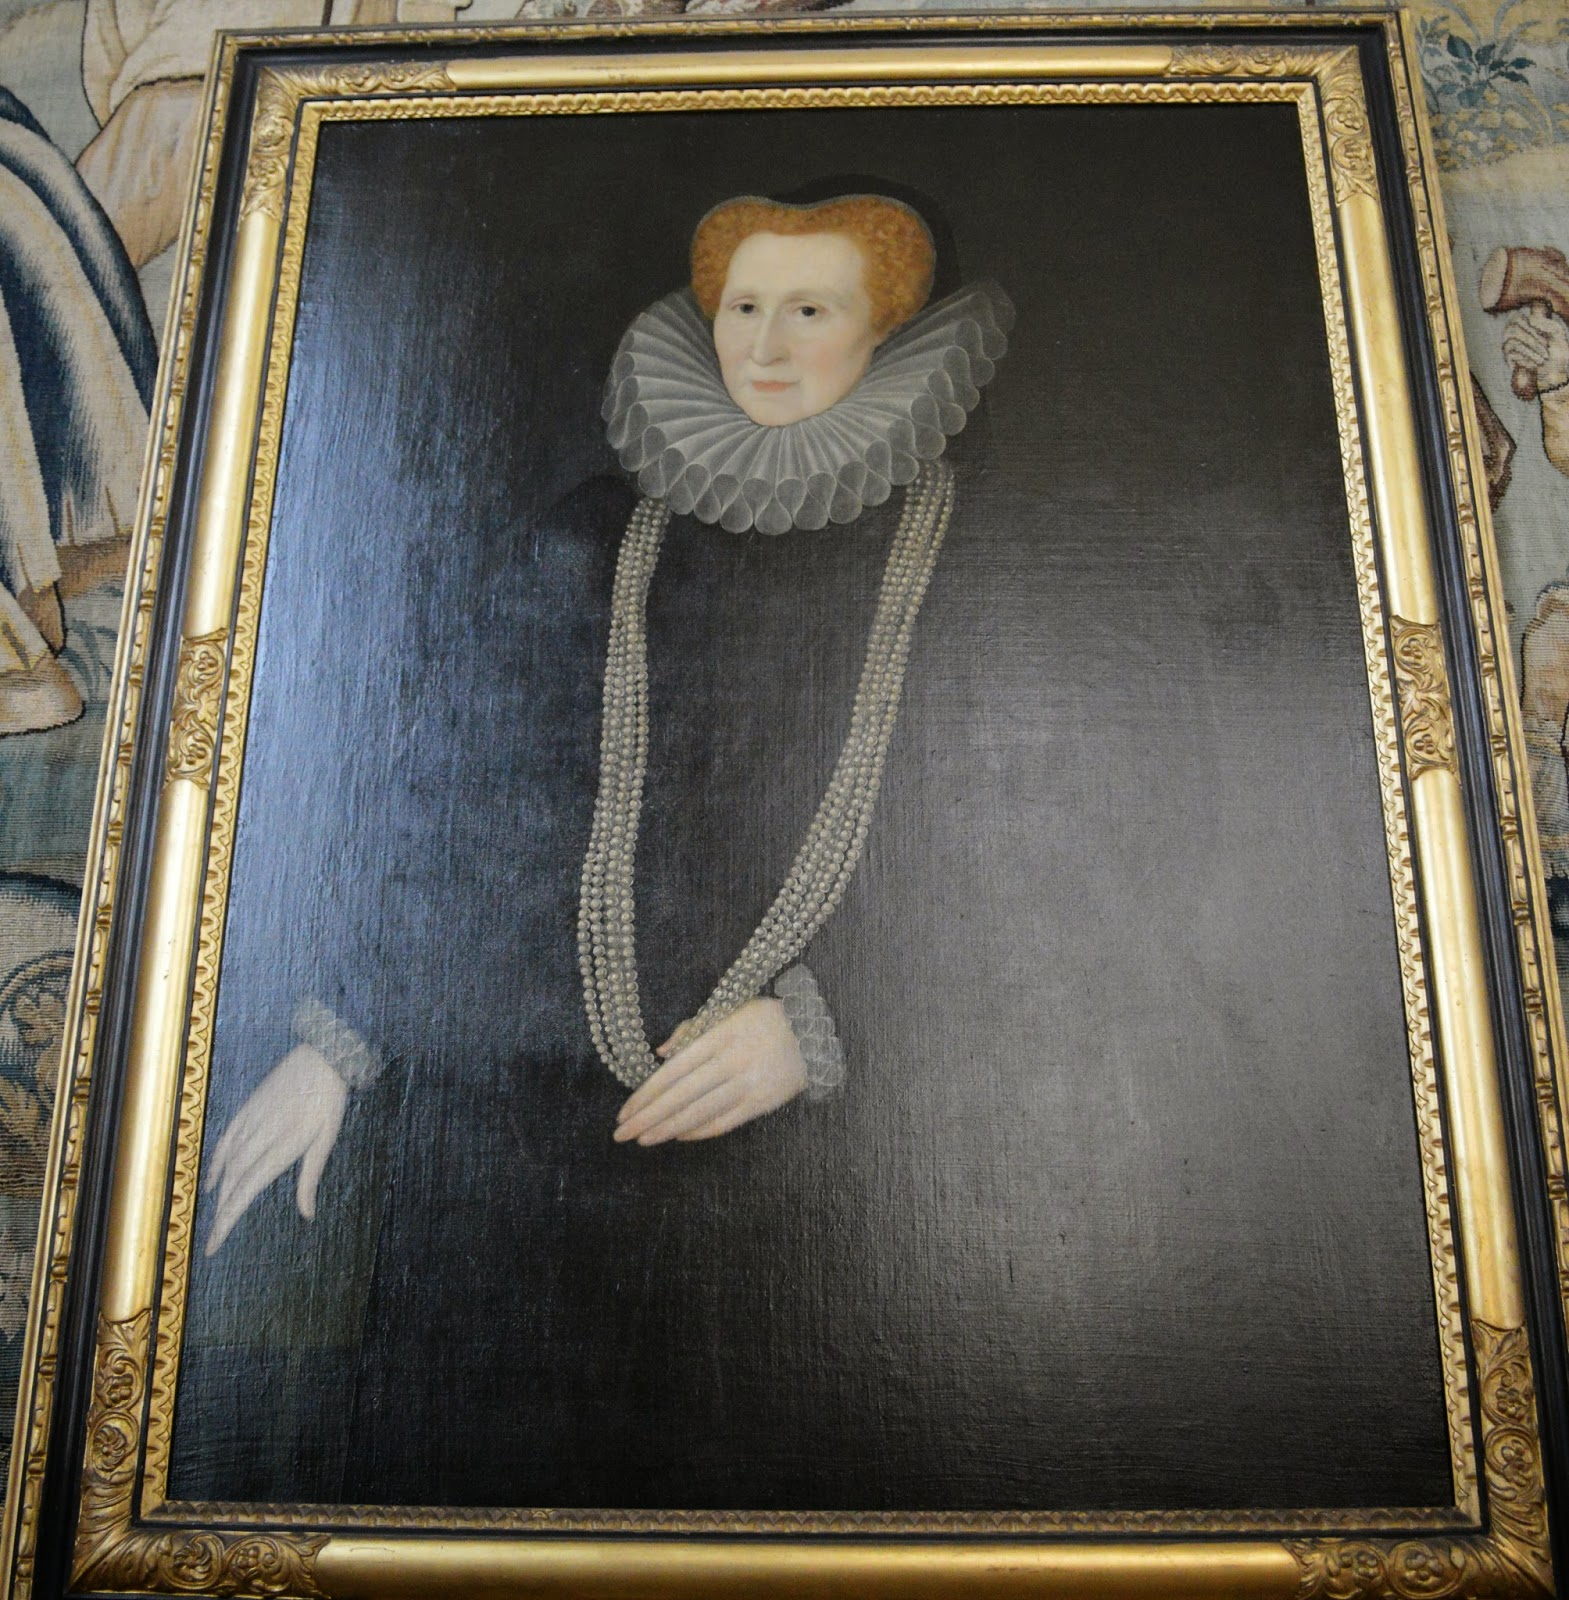 Hardwick Hall, inside, historical properties, interior, National Trust, visit, Derbyshire, Bess, Talbot, Elizabeth Shrewsbury, floor rushes, portrait, bed chamber, kitchens,